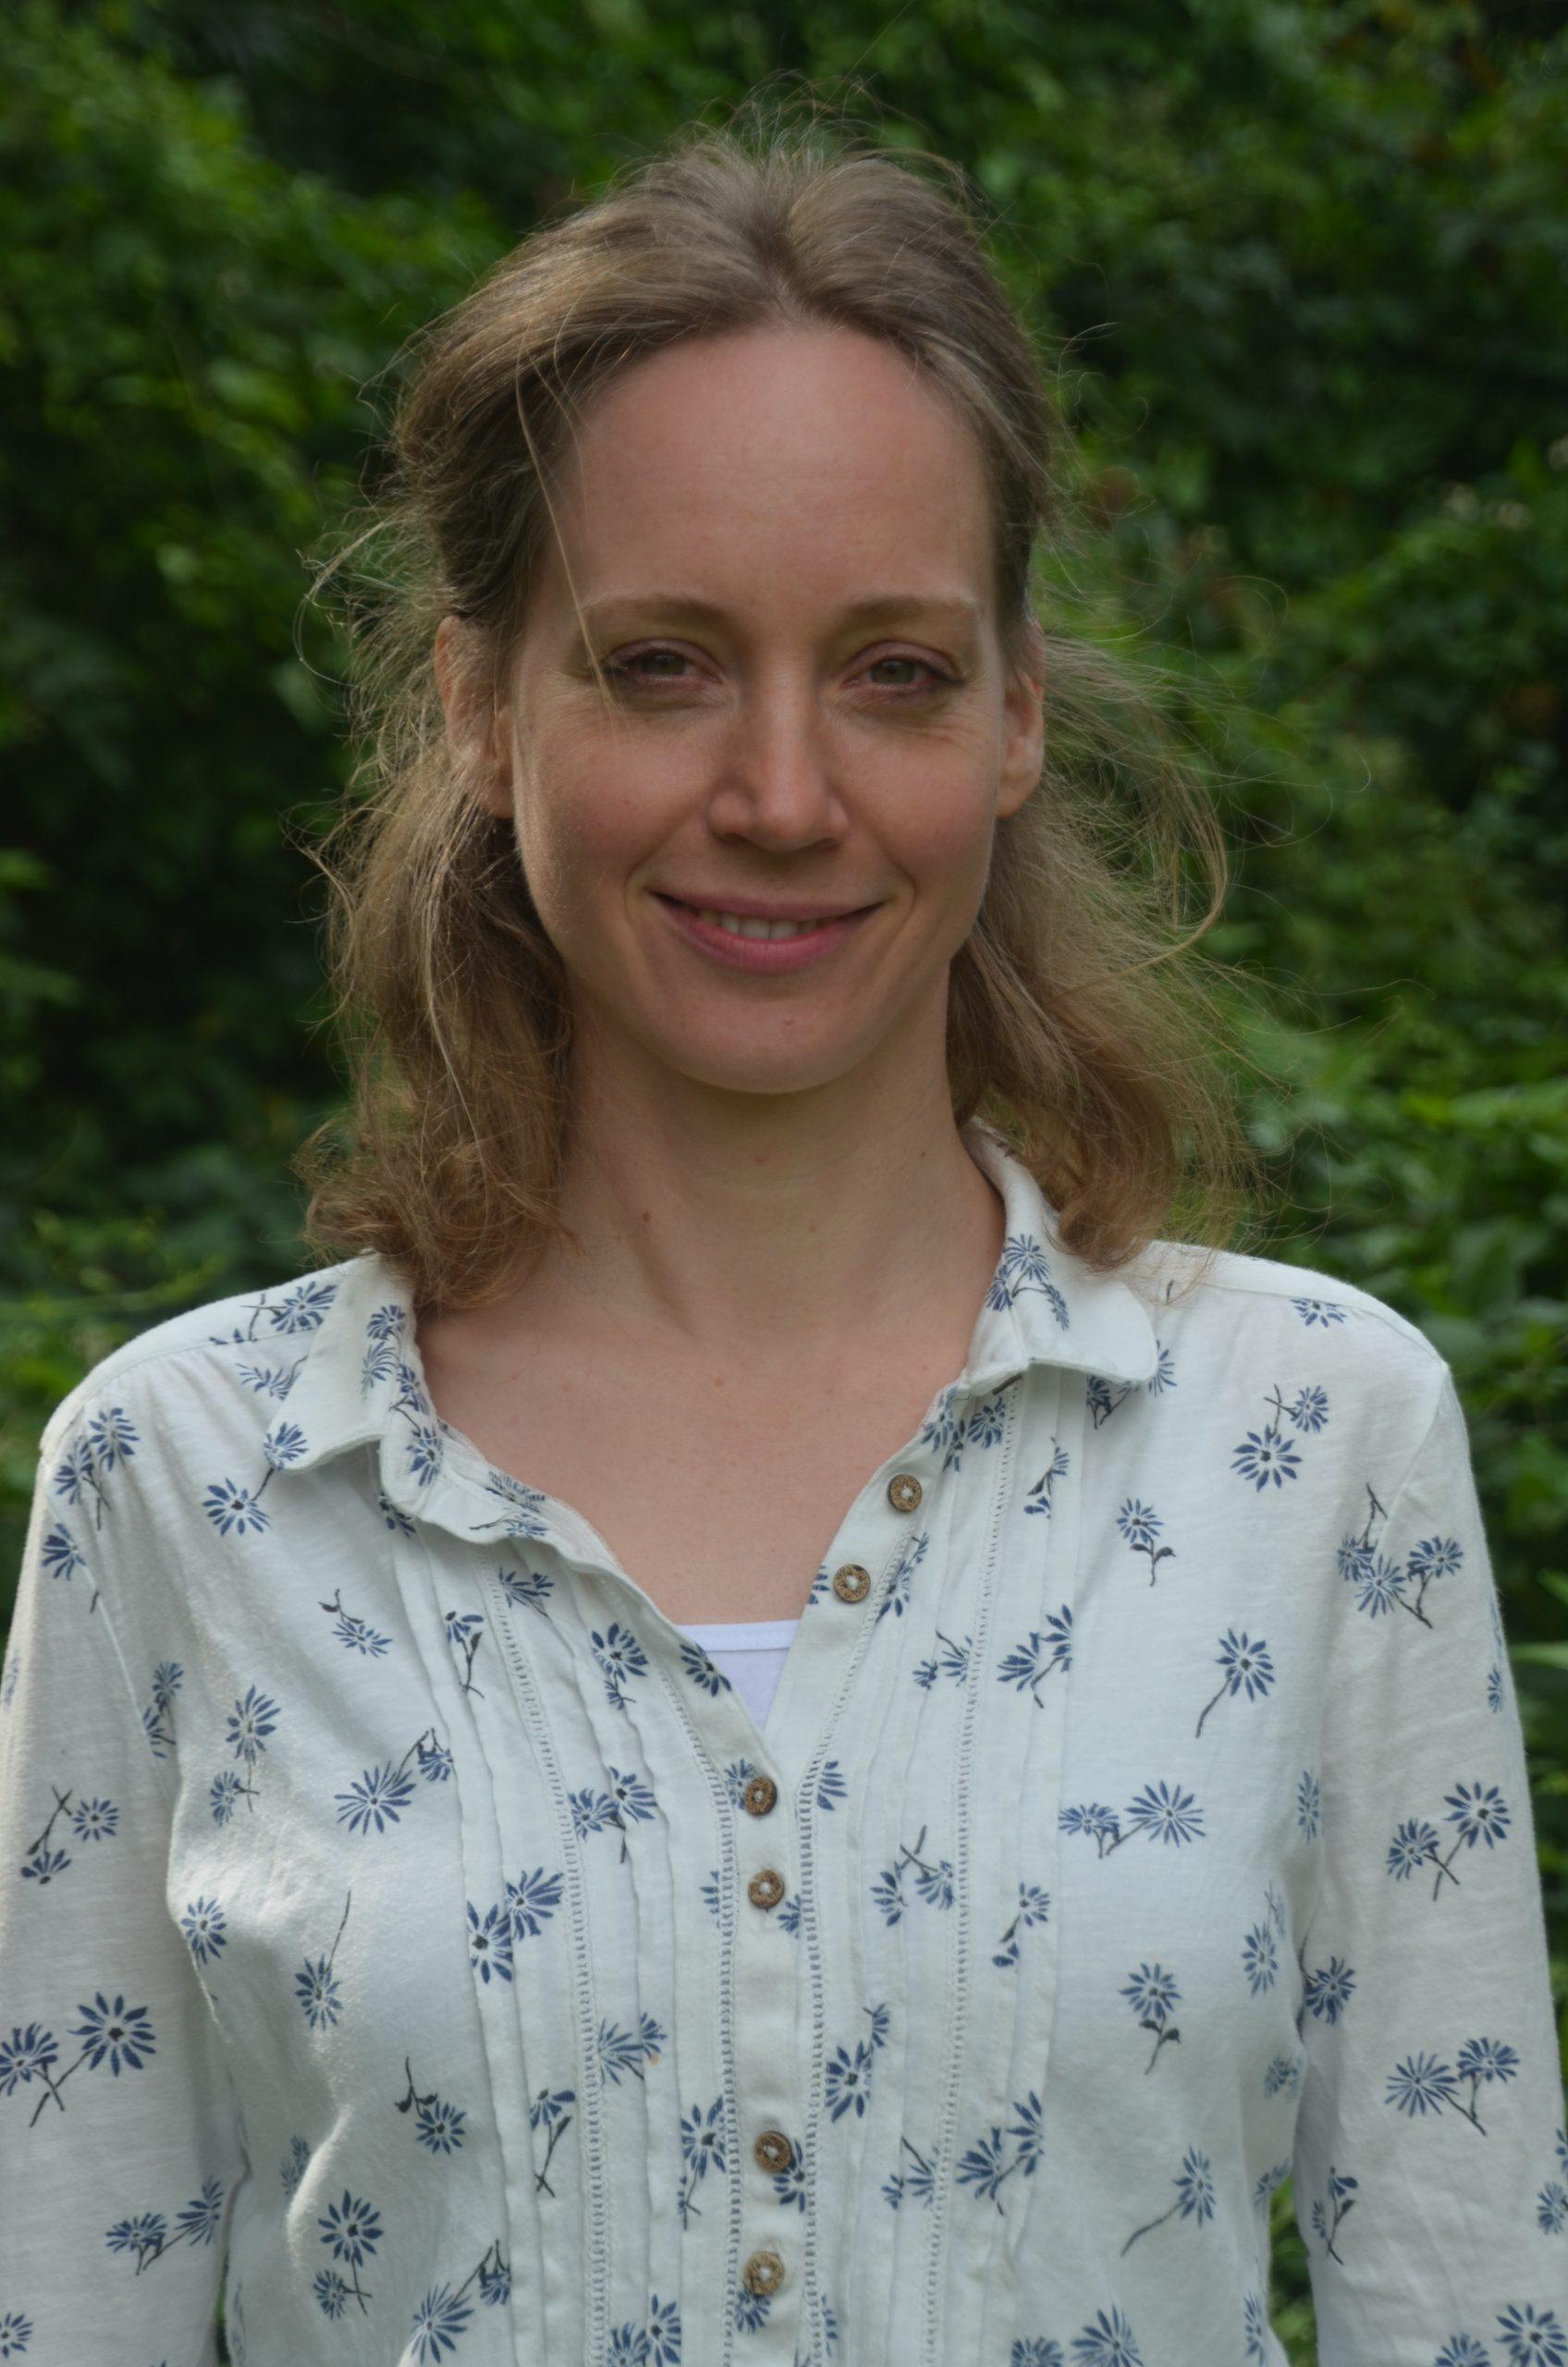 Frau Lorenzen